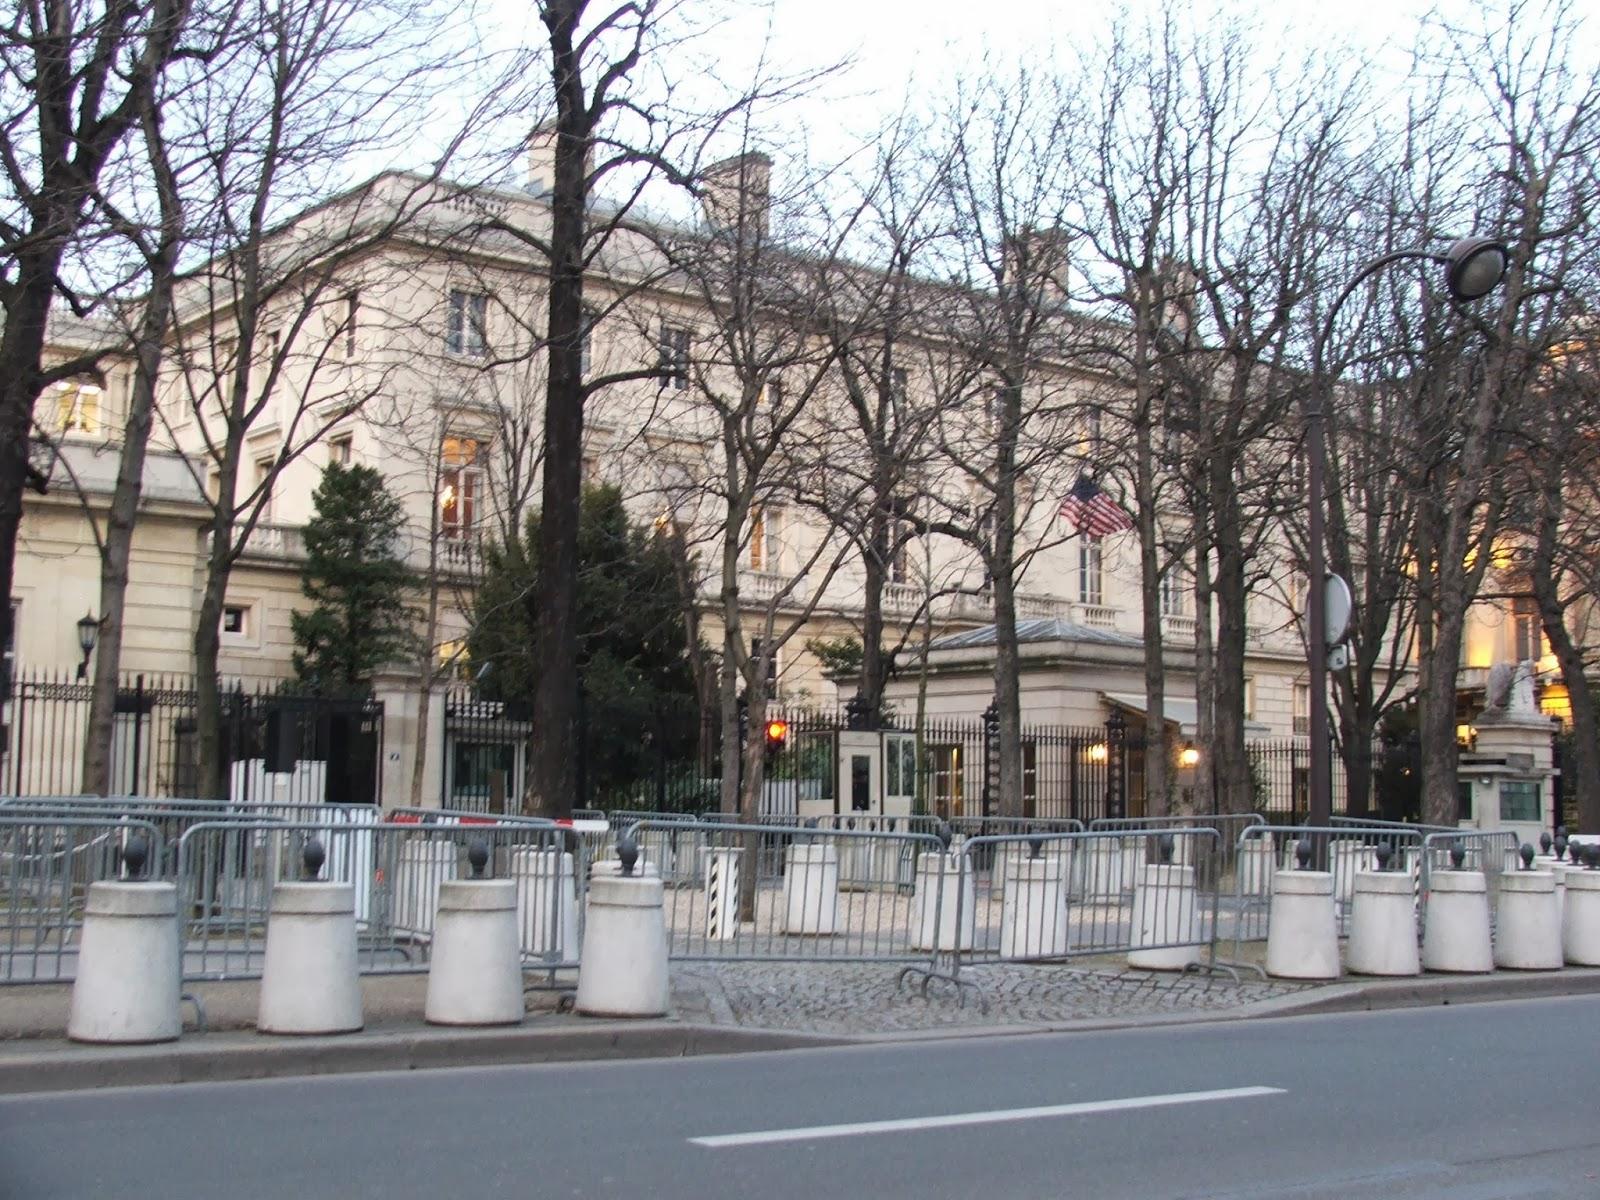 Ambassade des états unis à Paris